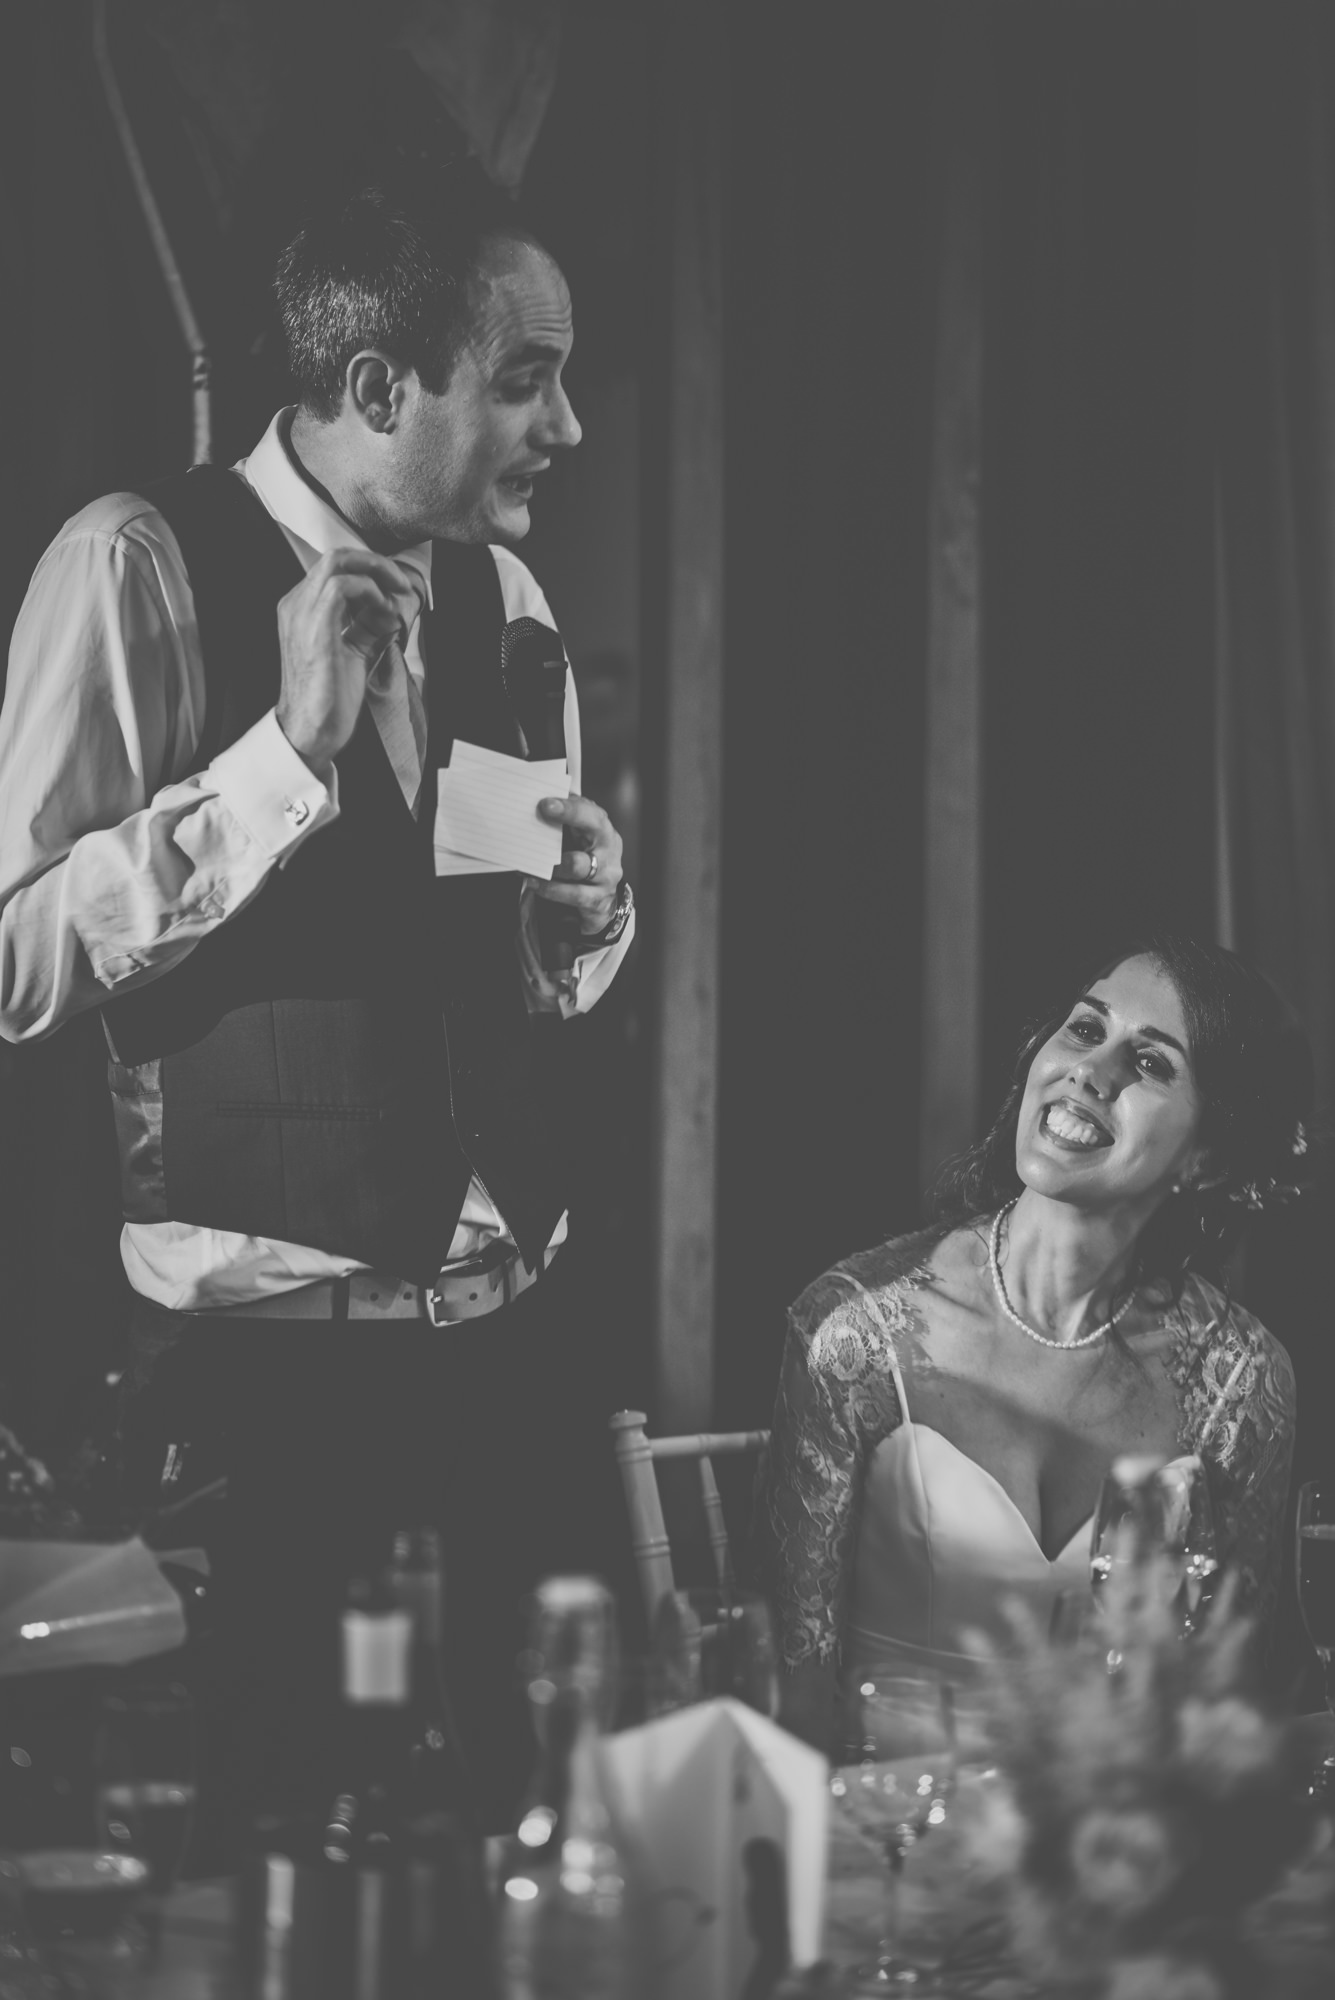 Charisse-and-James-wedding-in-Cain-Manor-Venue-Hampshire-Manu-Mendoza-Wedding-Photography-481.jpg